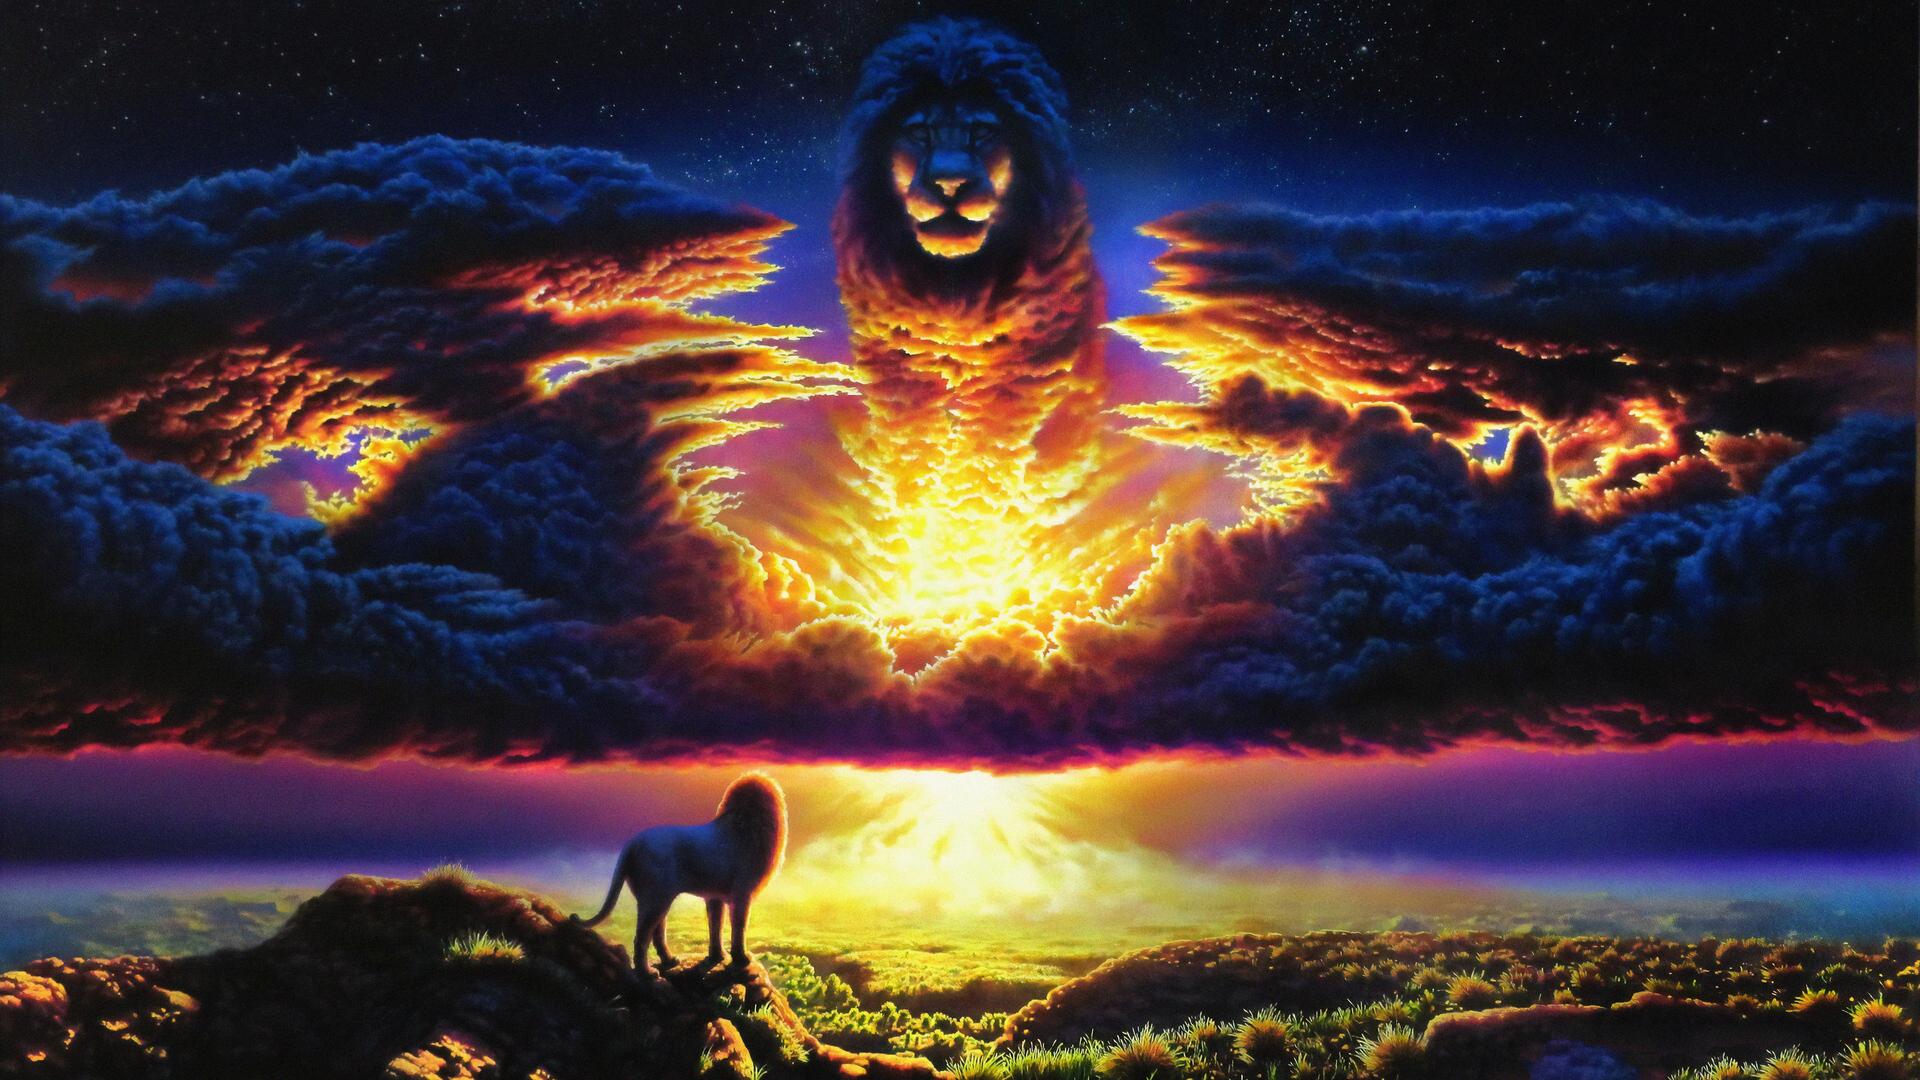 1920x1080 The Lion King 2019 Art Laptop Full Hd 1080p Hd 4k